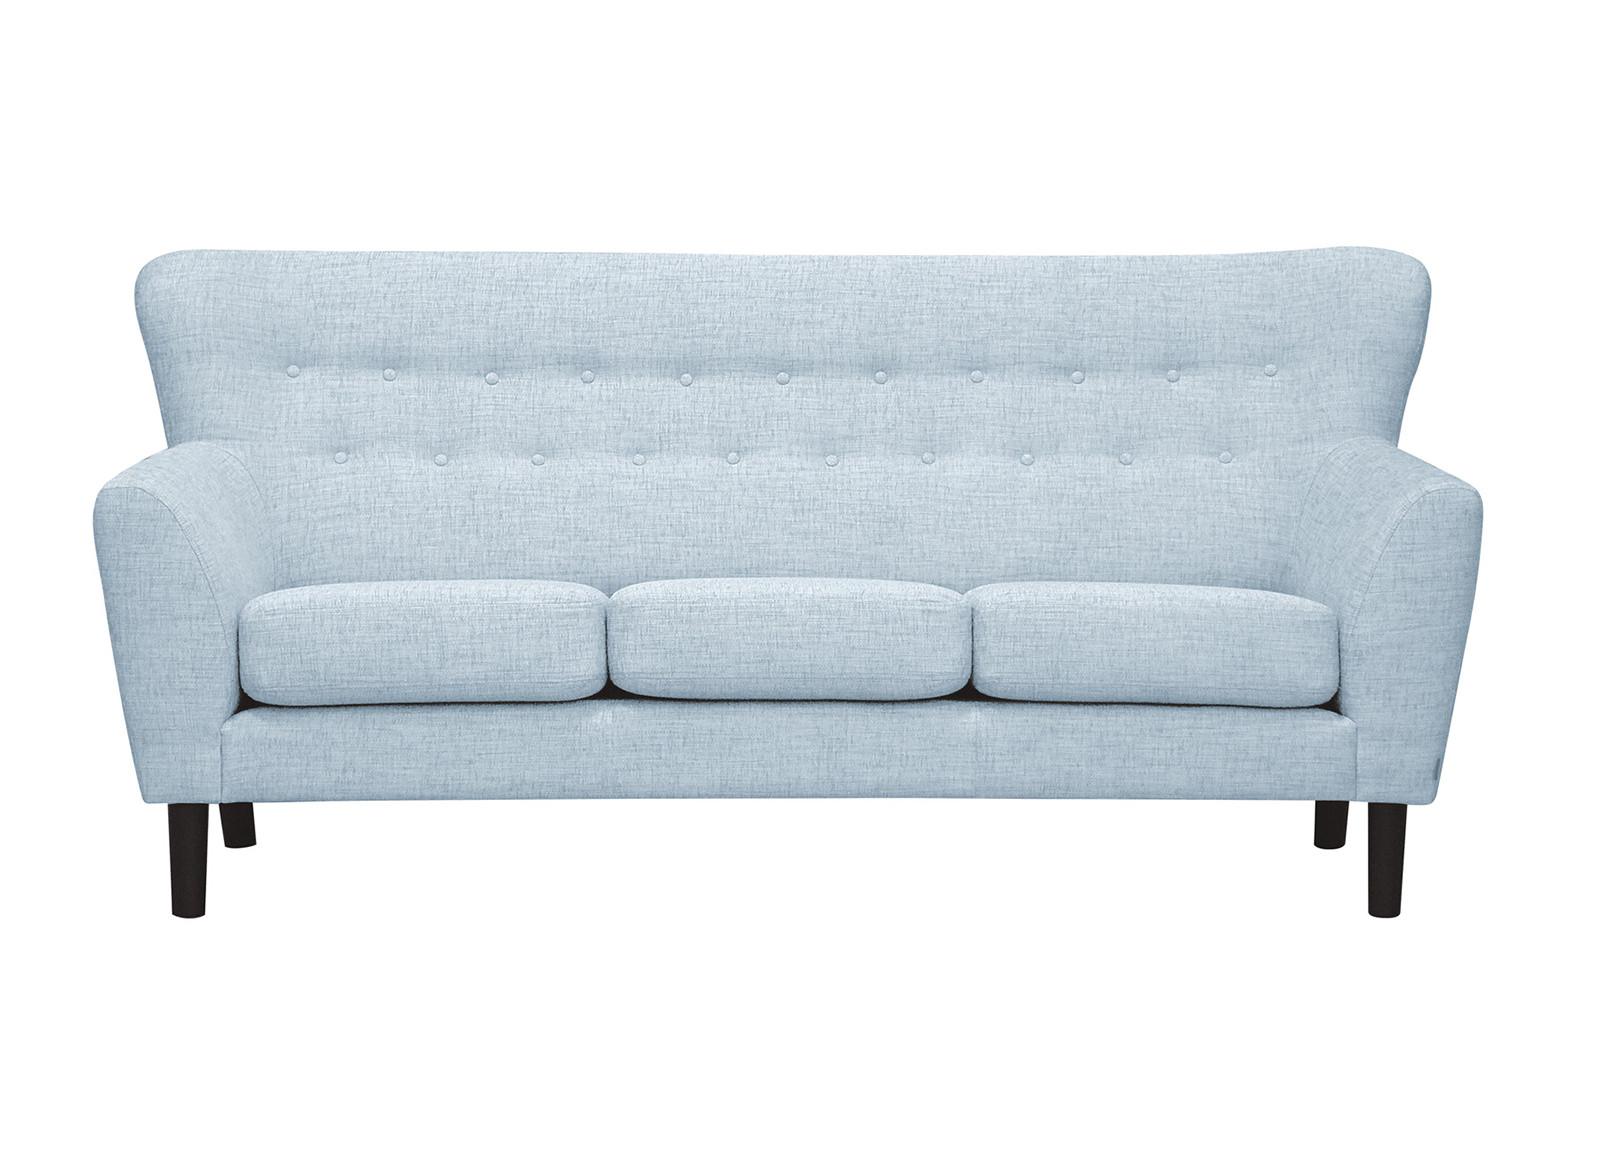 Djup Soffa 3sits Soffa Soffa 100 4 Sits Med Fotpall Linne Grov2 Attic Living Area In Grey Via